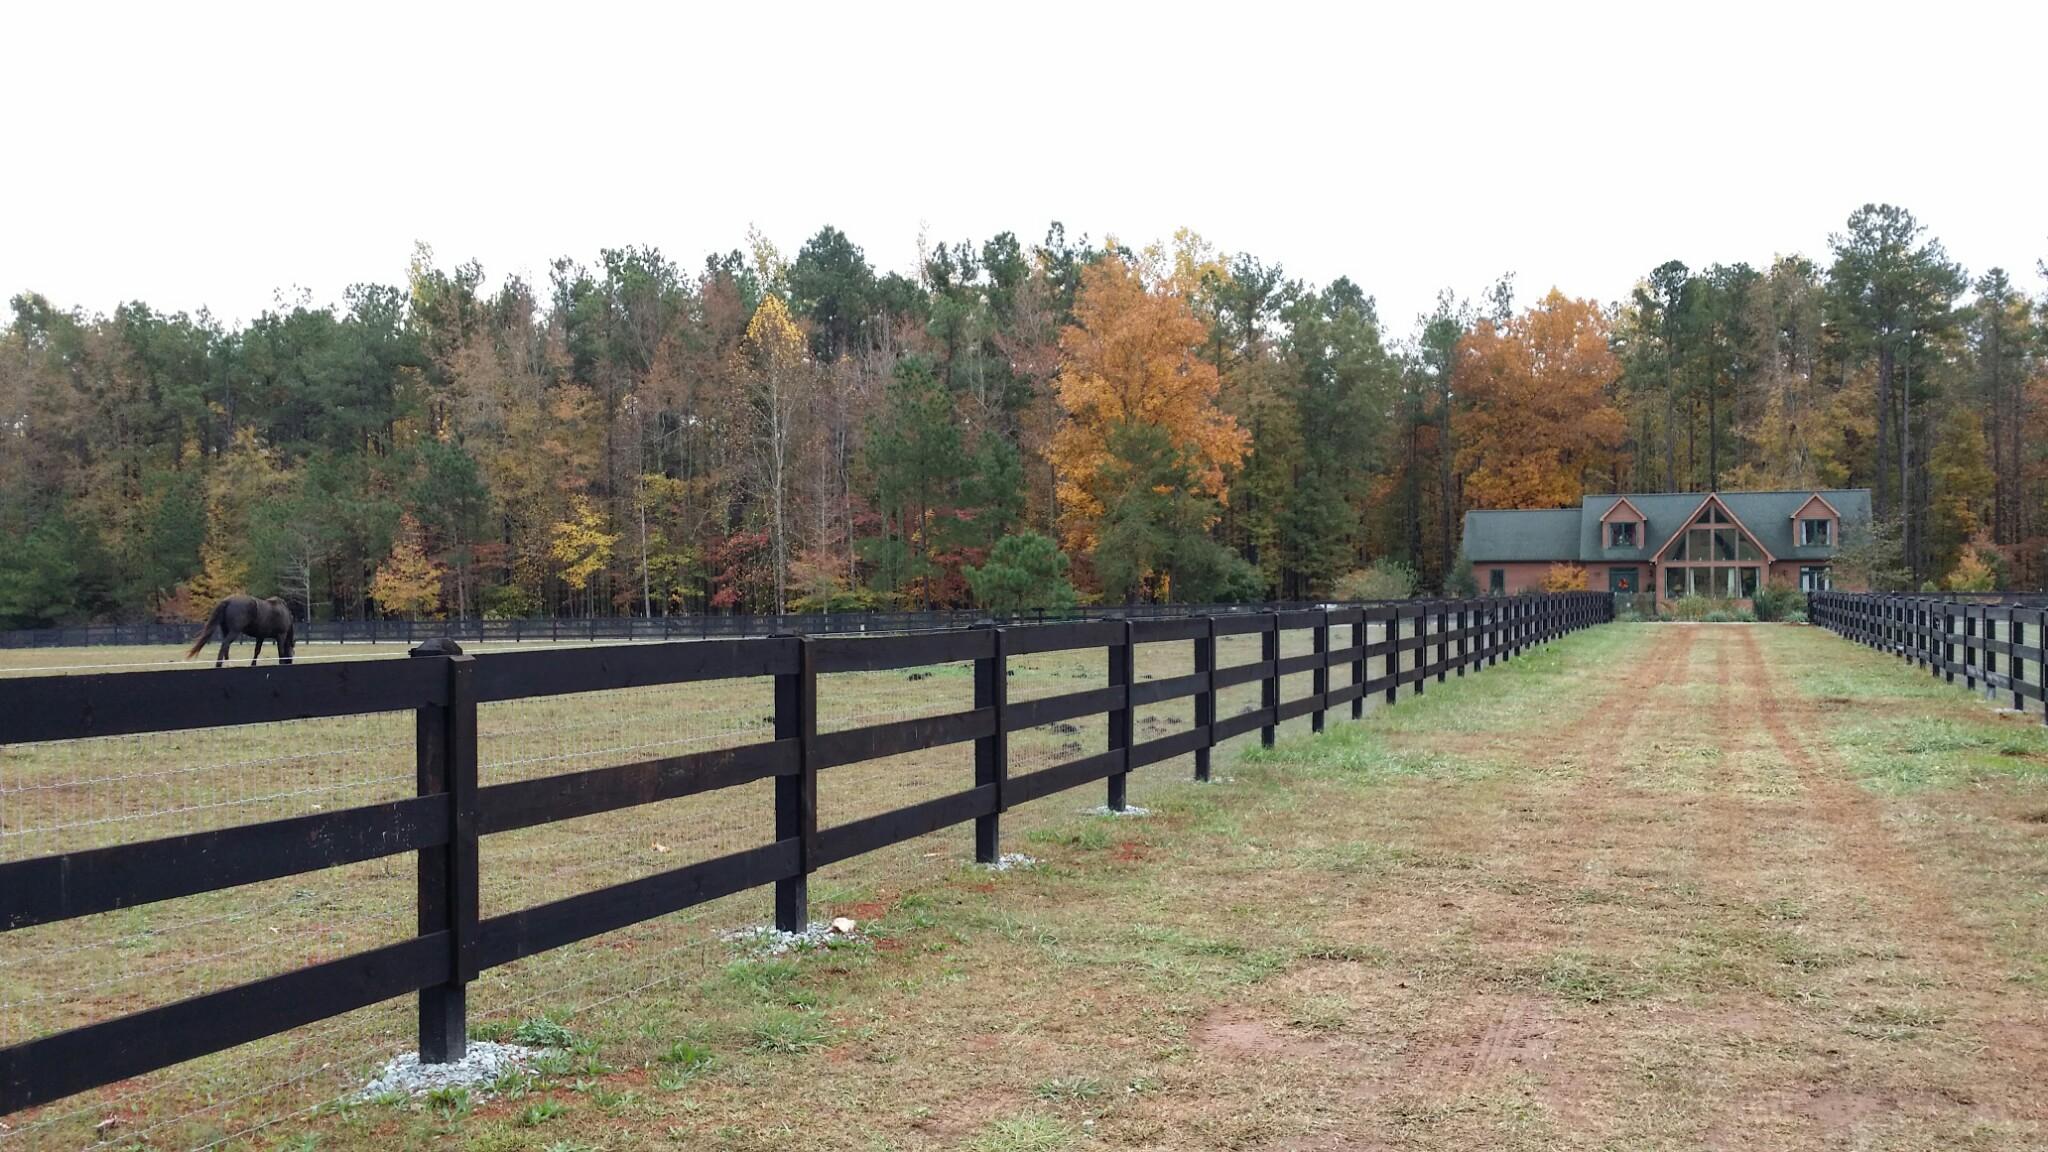 Deer fence specialty farm systems a 3 board with no climb mesh horse fence at rohan farm baanklon Choice Image